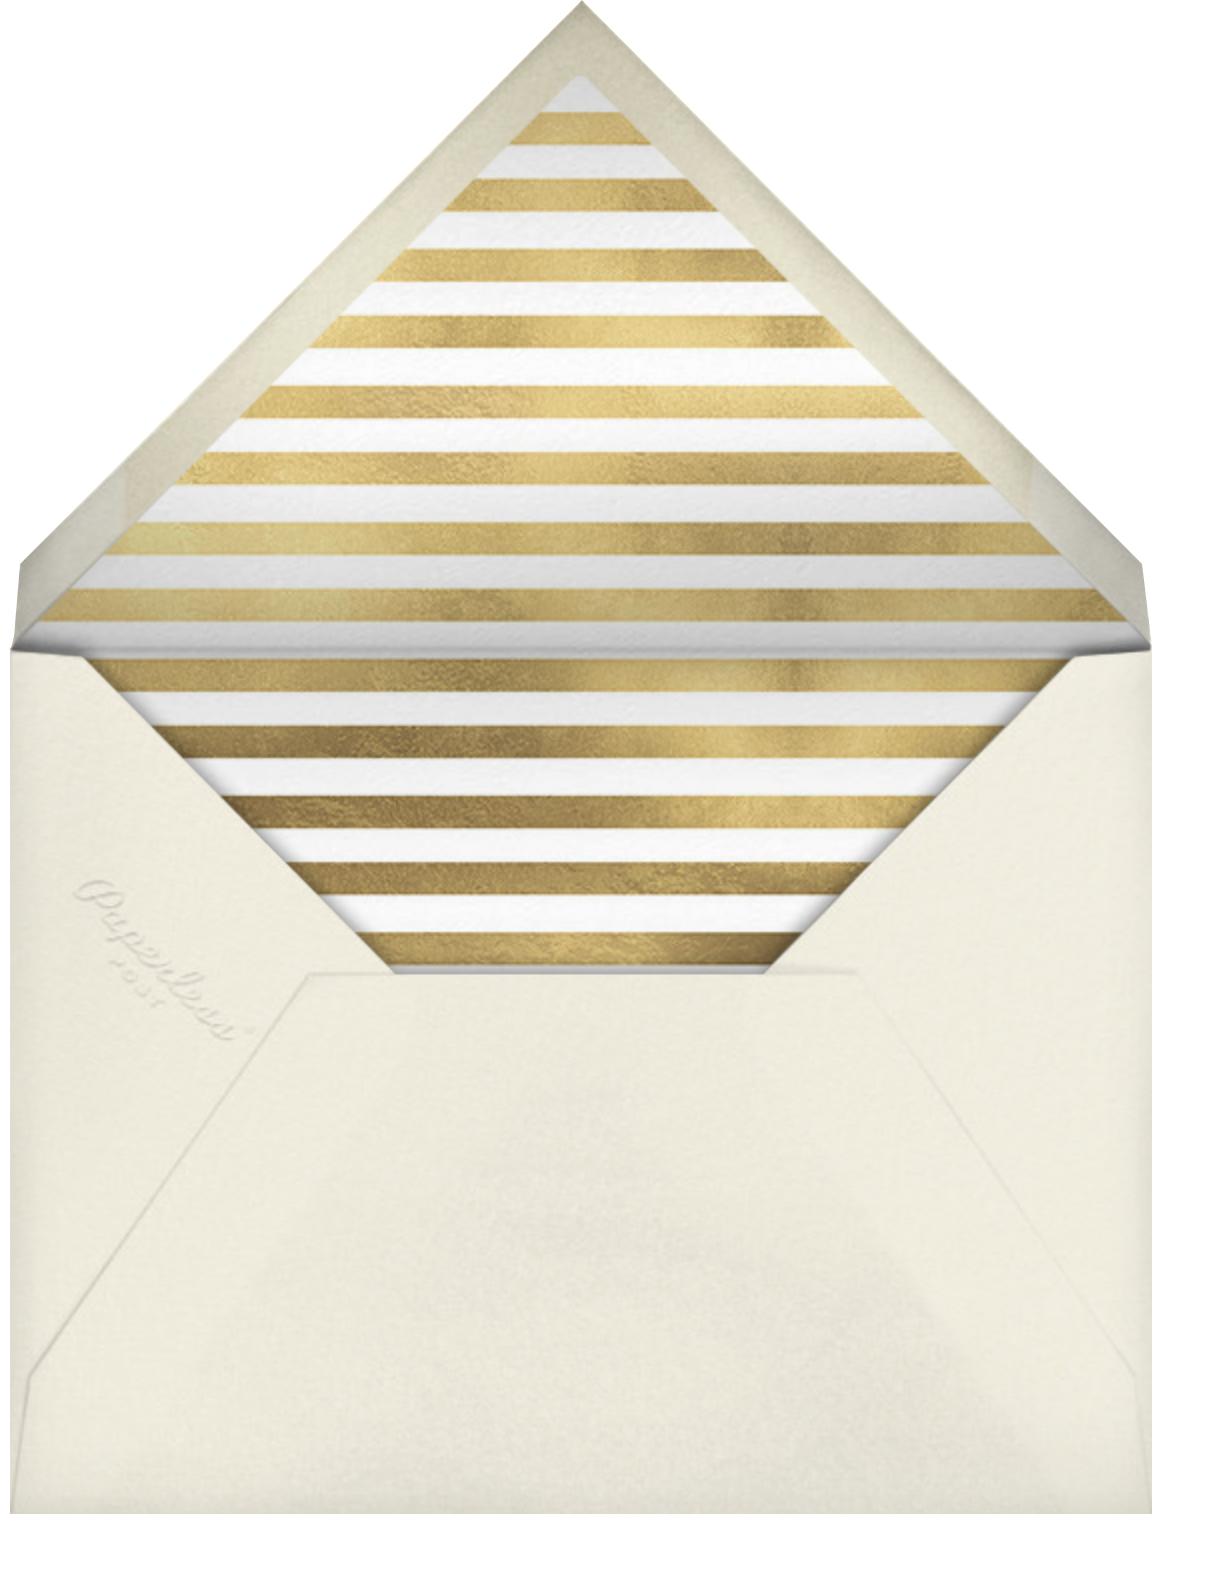 Better Halves Border - Caviar - kate spade new york - Anniversary party - envelope back